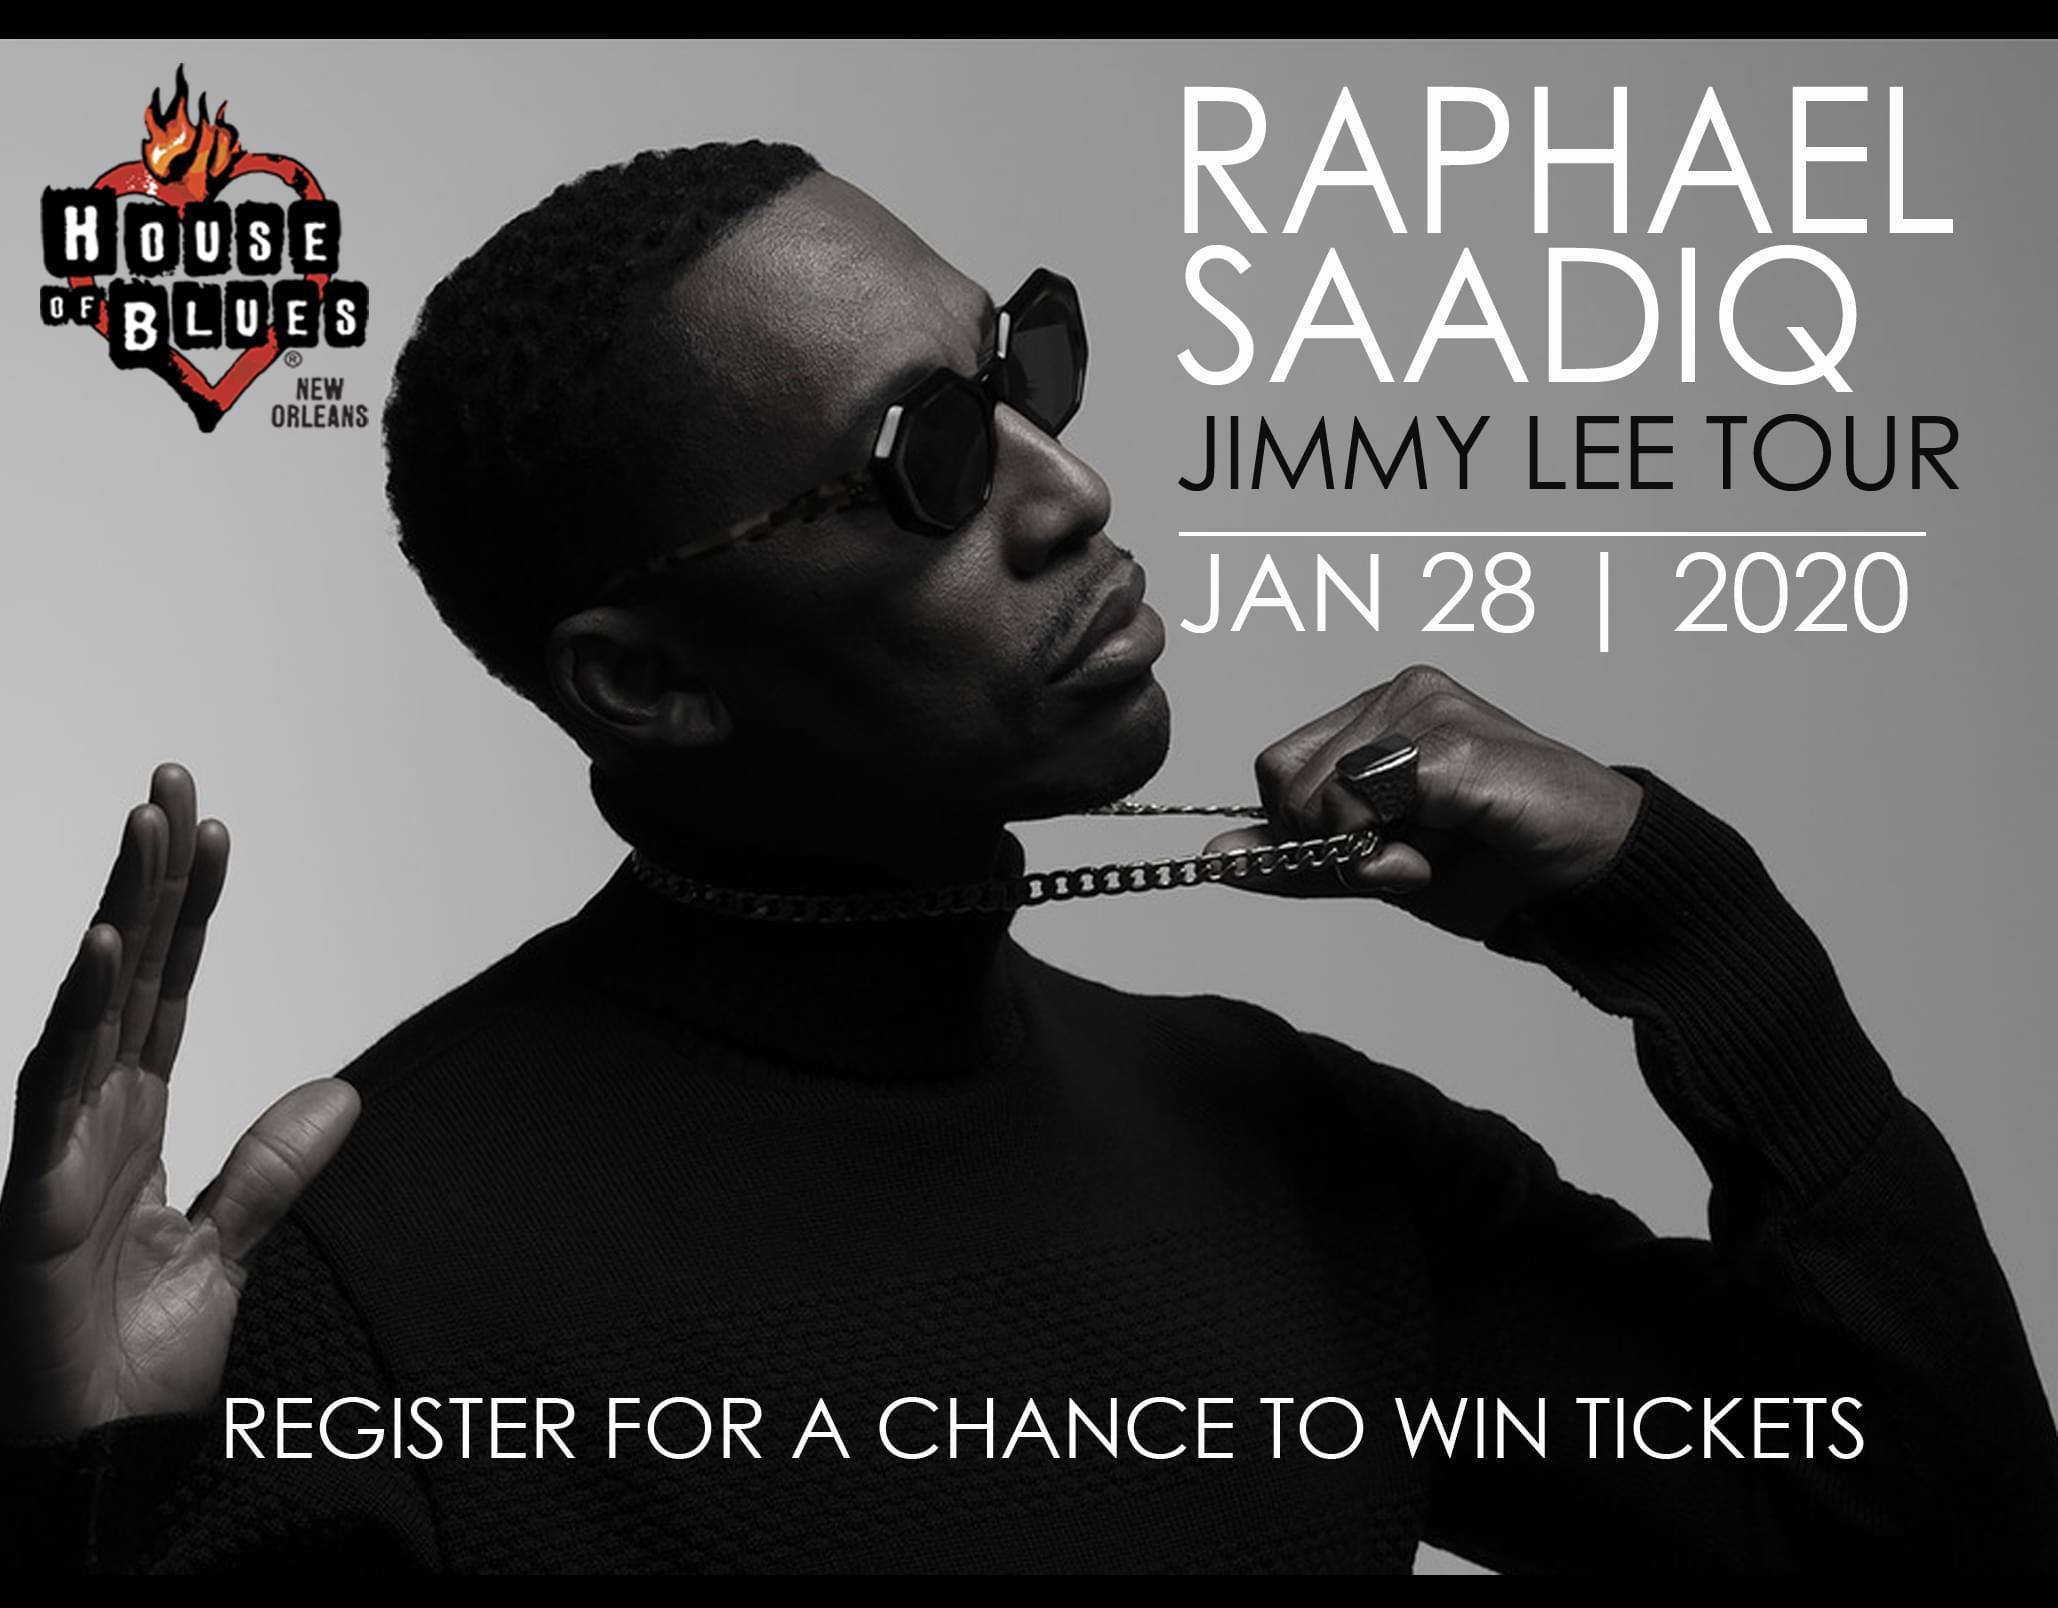 Win Tickets to see Raphael Saadiq